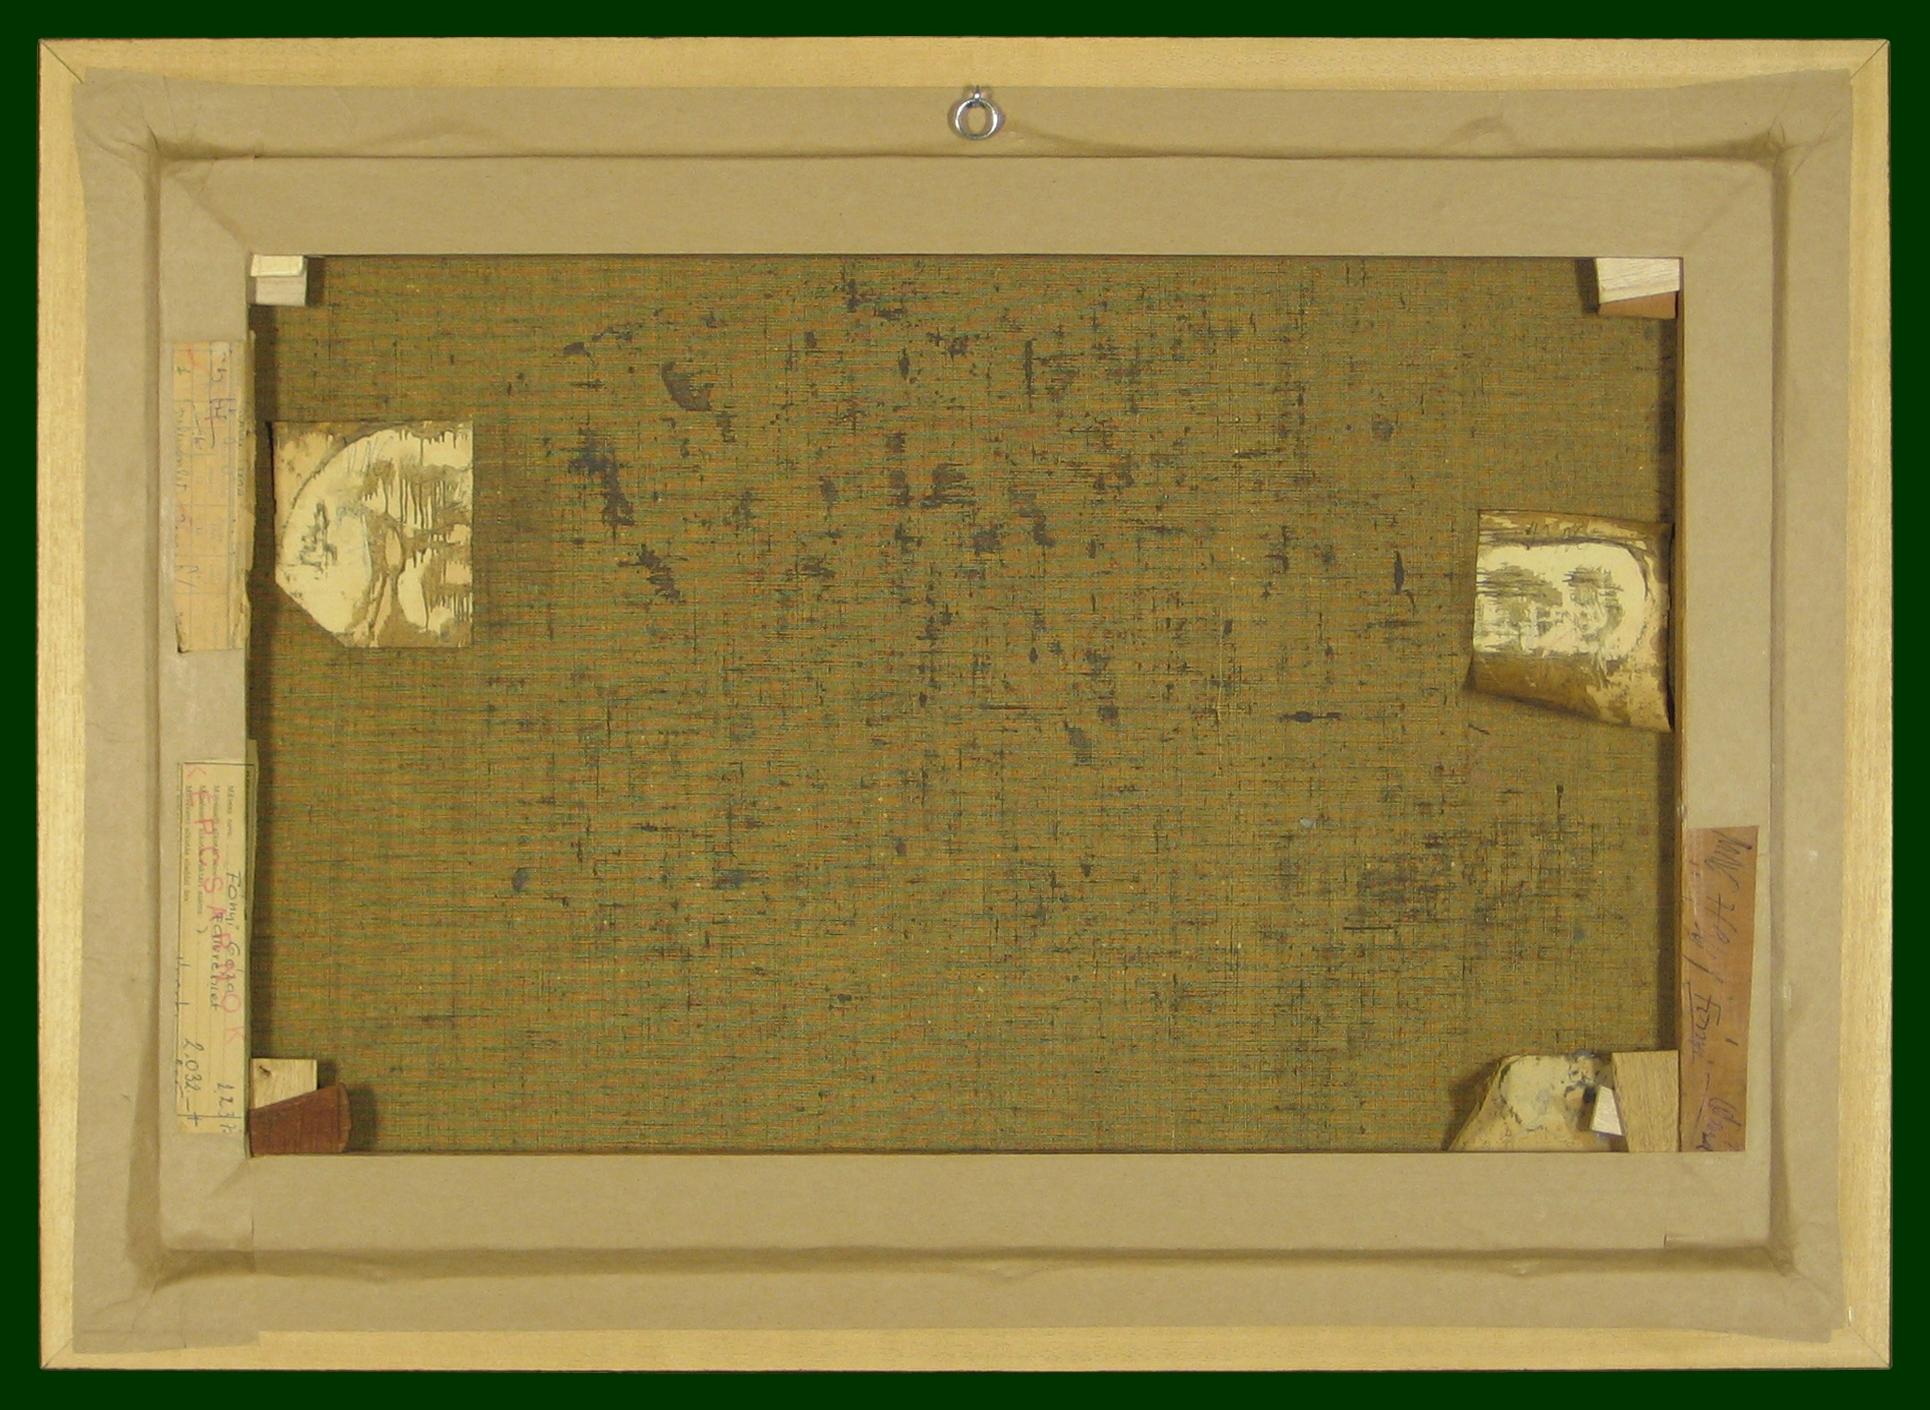 42-6h_t.jpg (1930�1410)